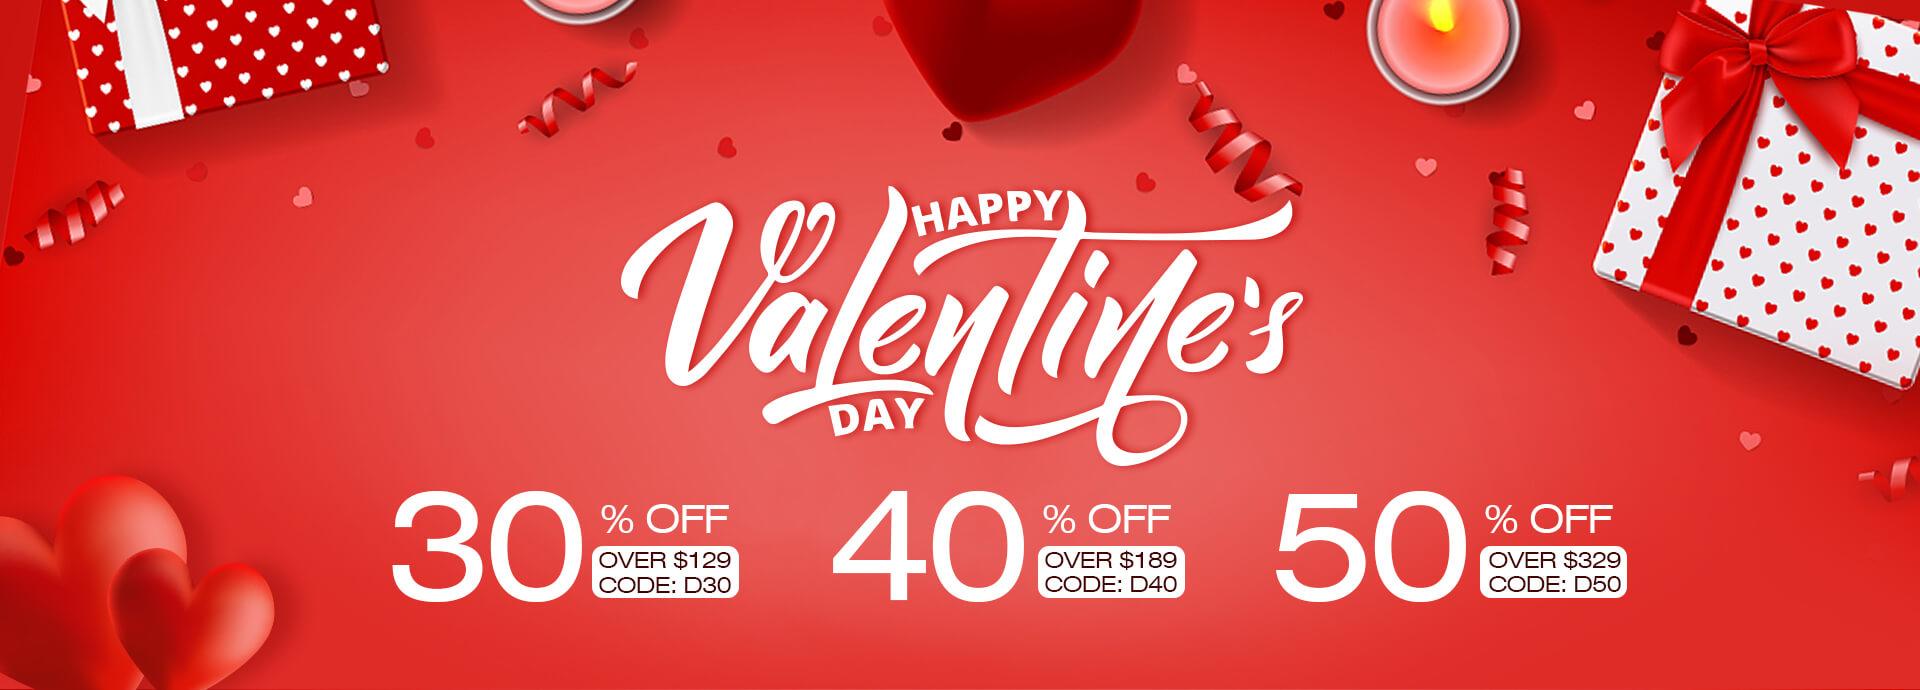 Lajerrio Valentine's Day Sale